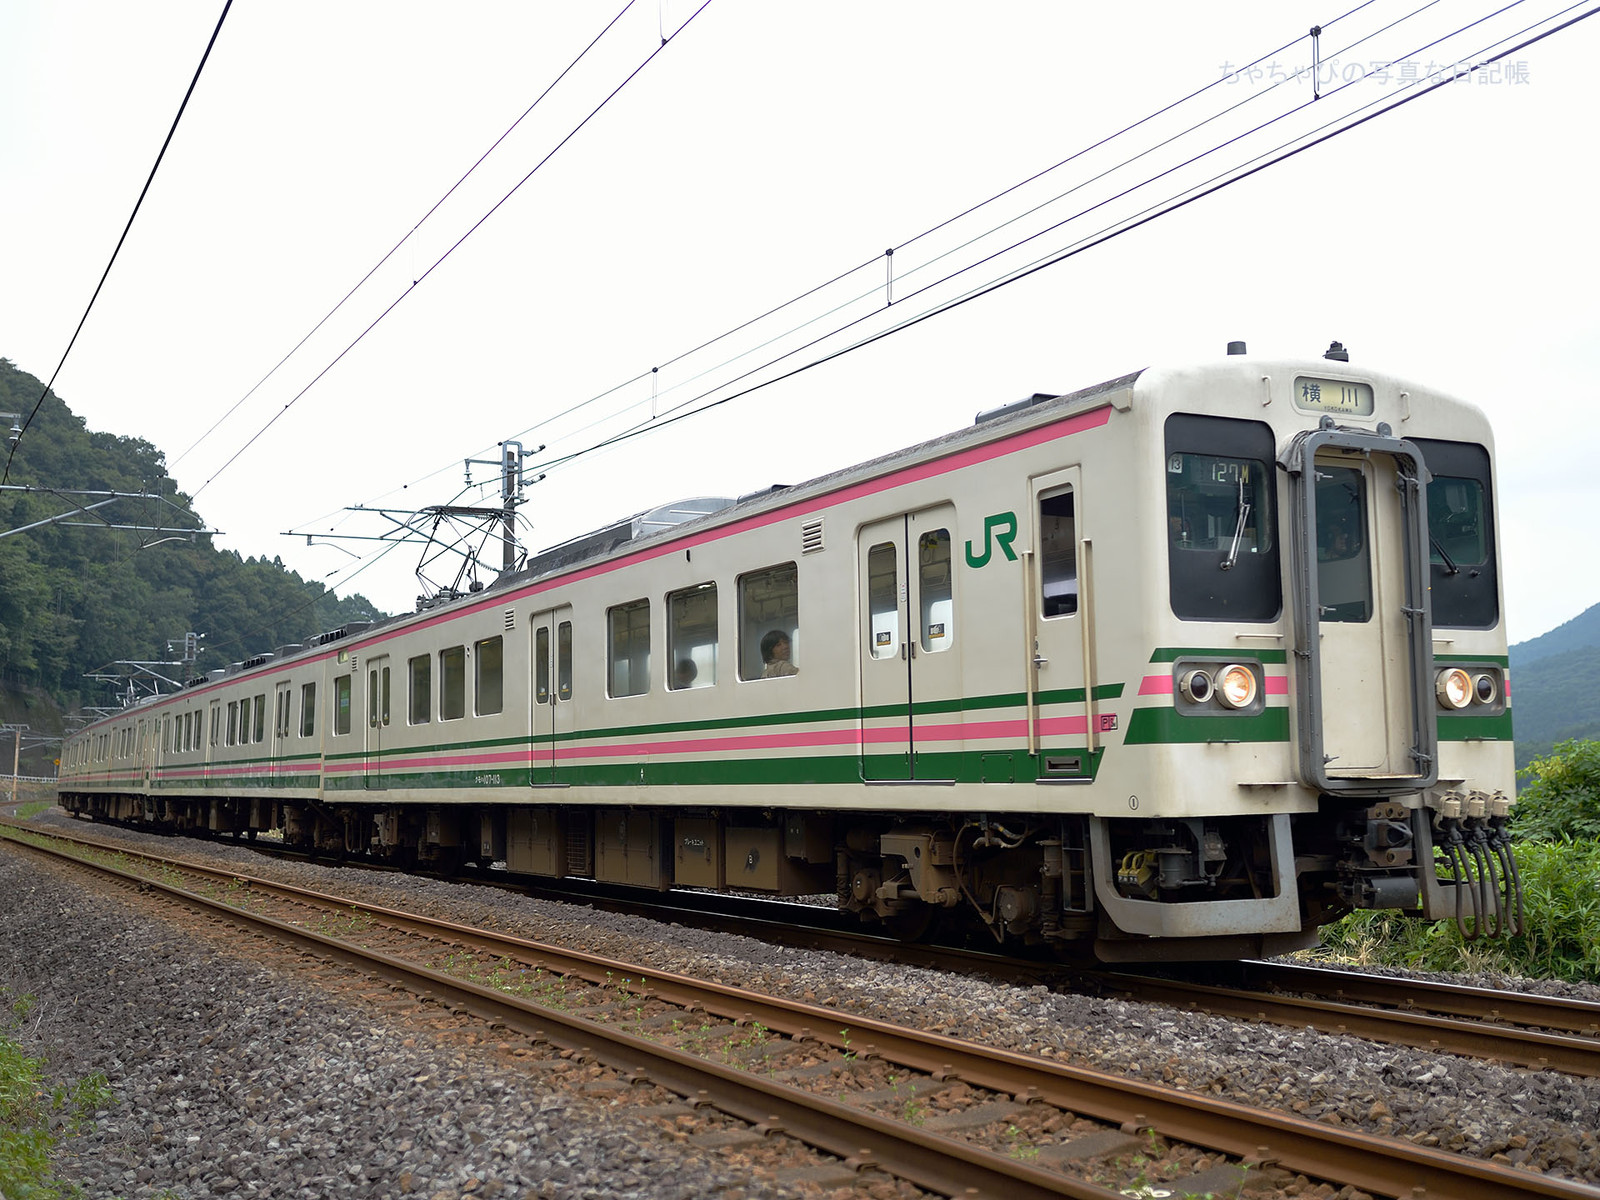 JR東日本 信越本線 西松井田駅~横川駅 107系100番台 -R13編成-